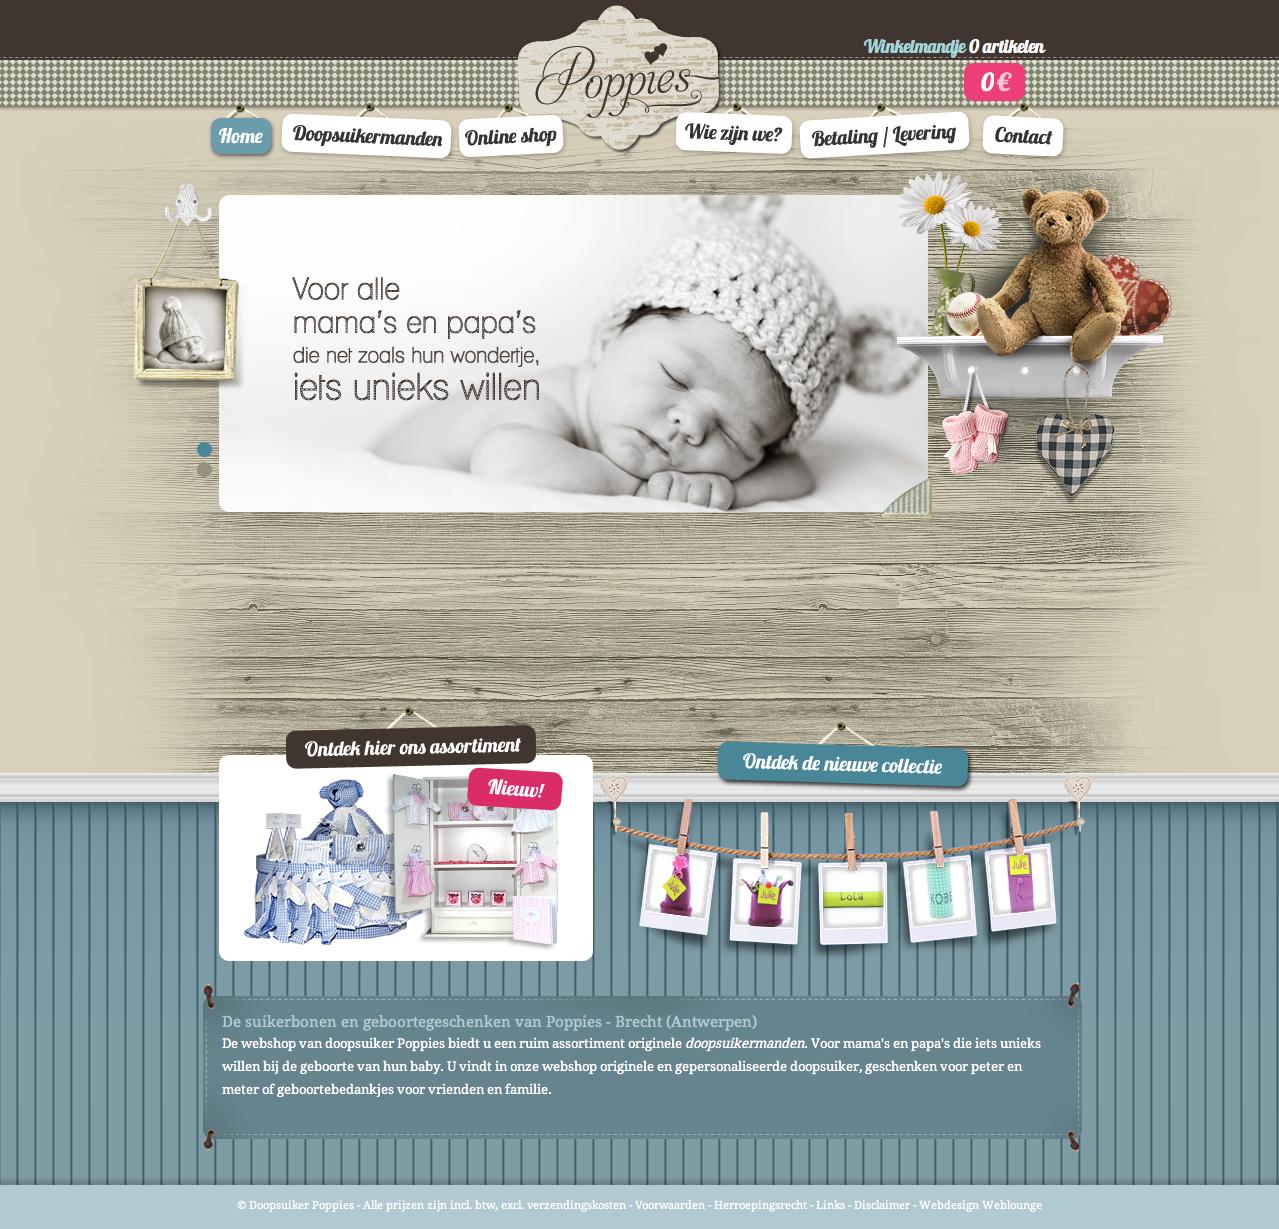 Scrapbook inspired web design